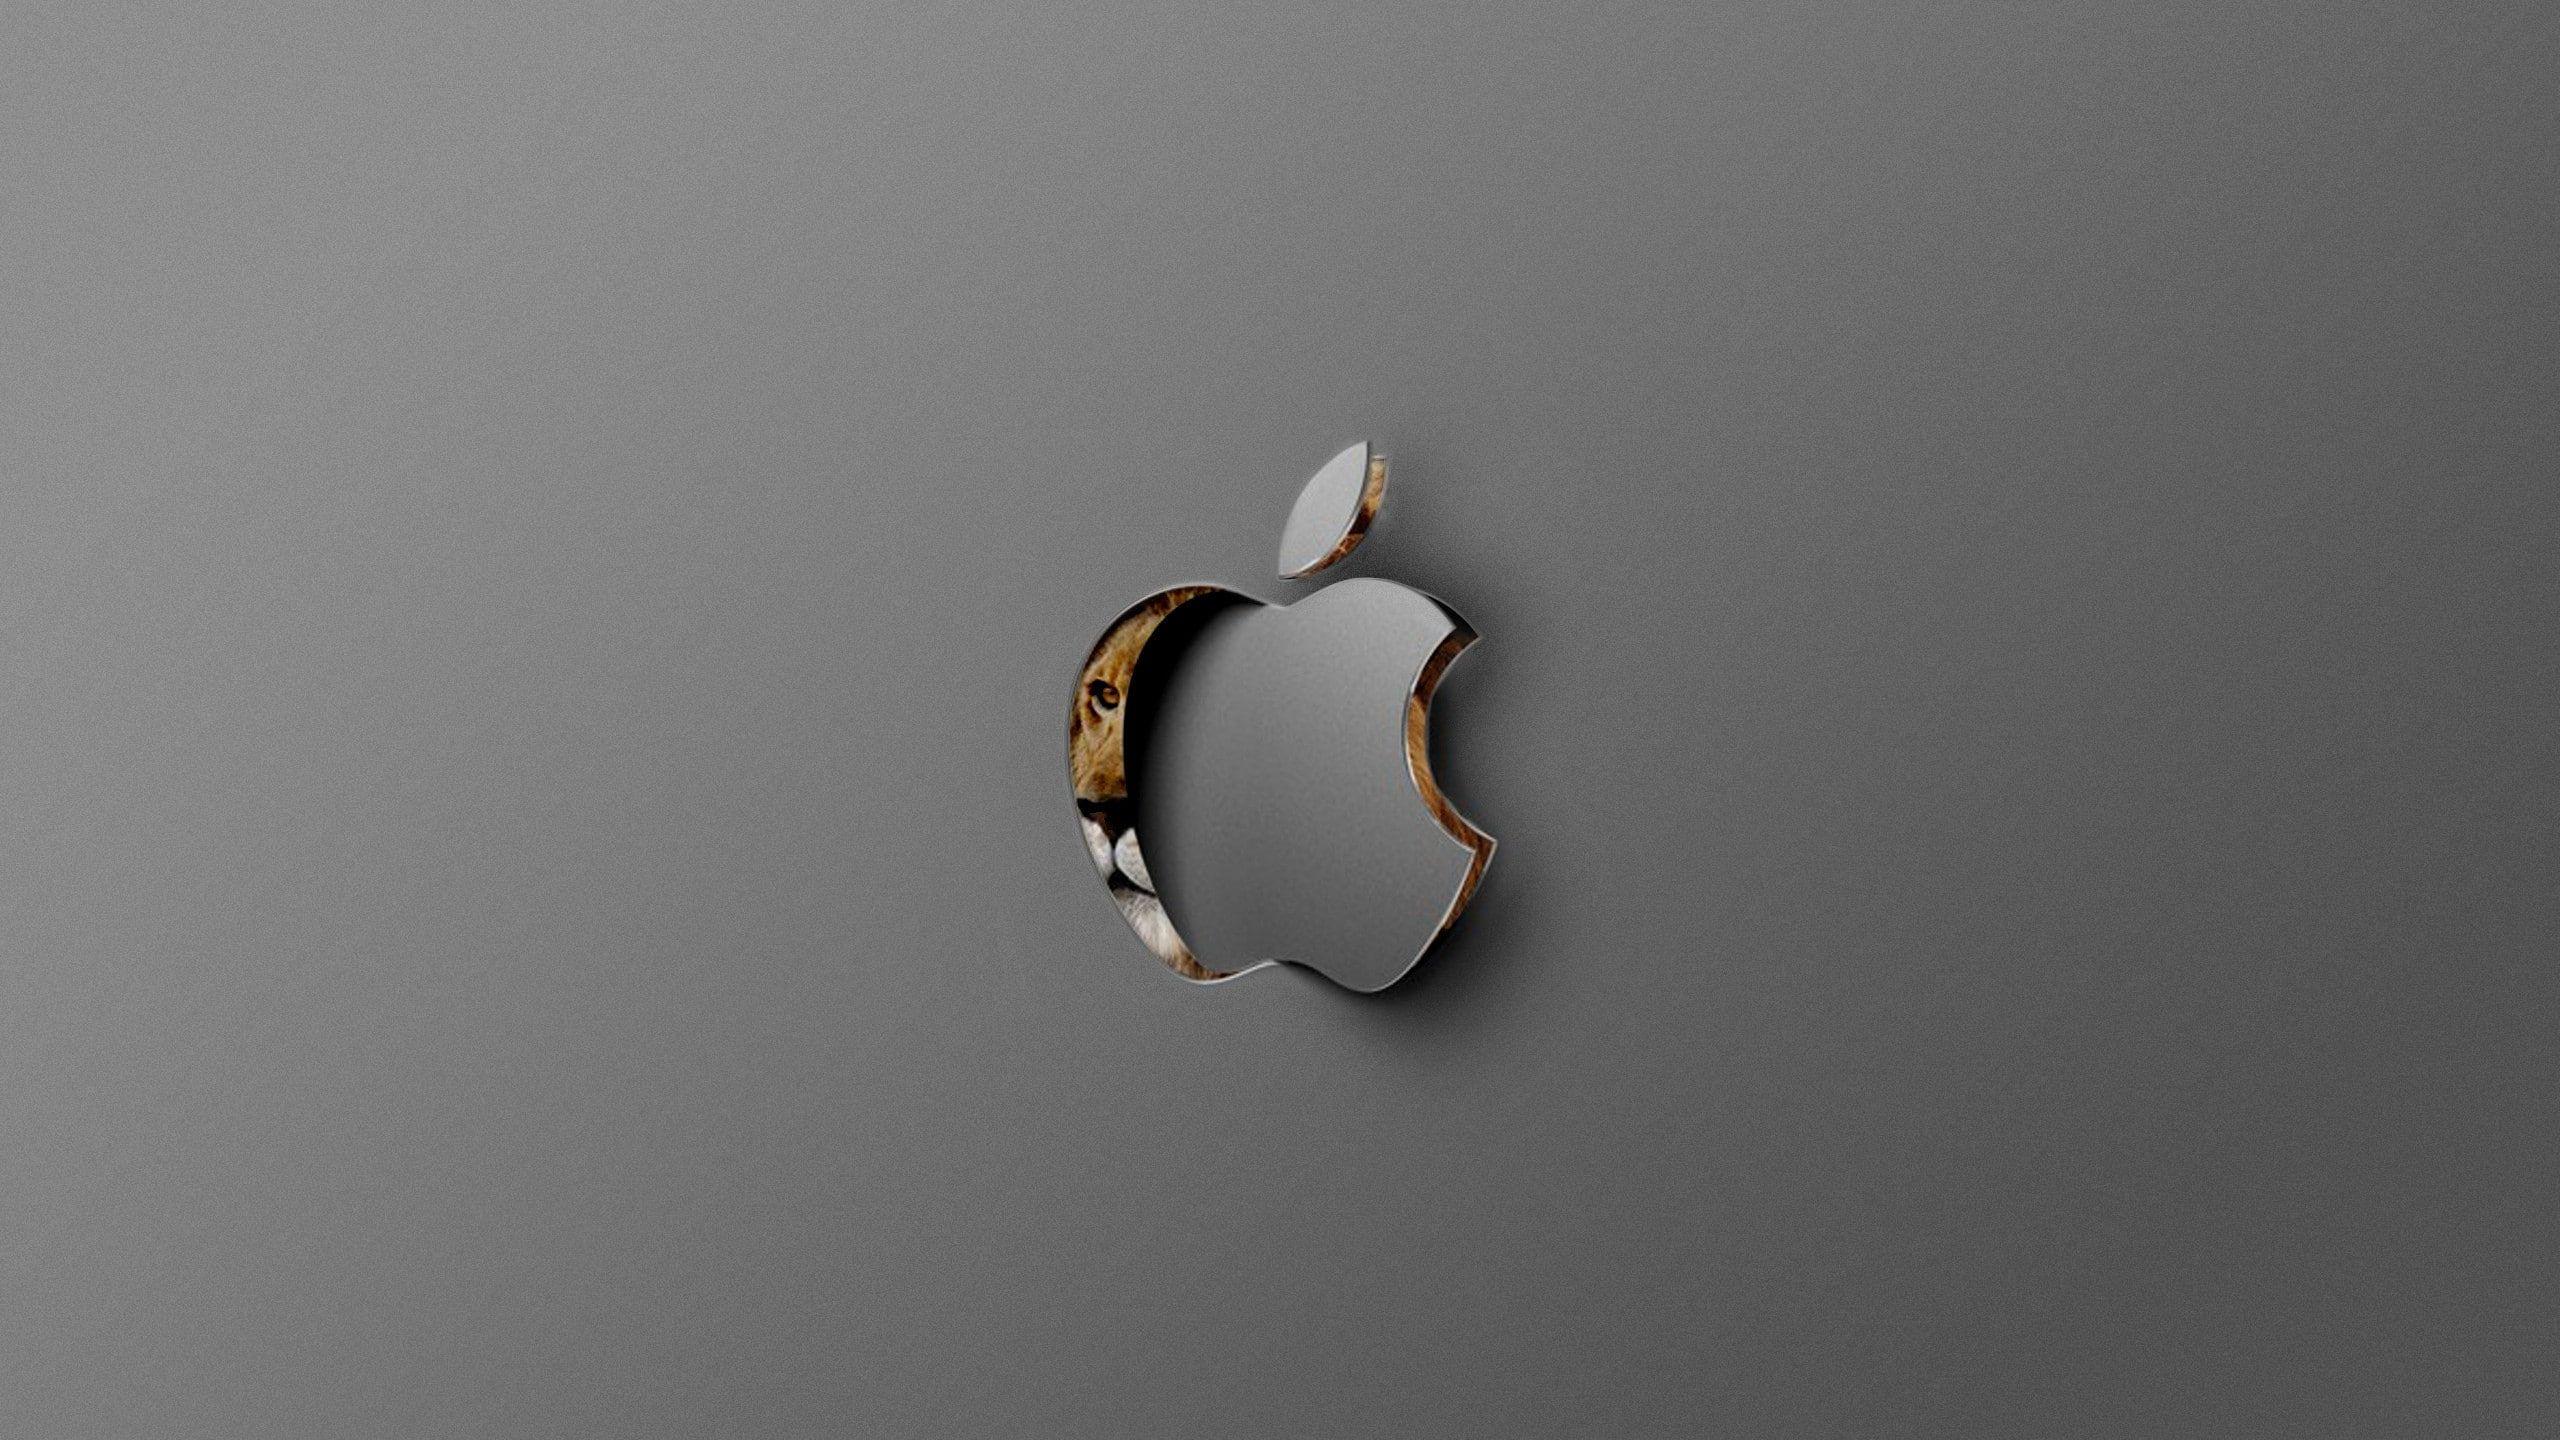 Computer Computers 2560x1440 Mac Os X Lion Os Mac Apple Macintosh 2k Wallpaper Hdwallpape Lion Wallpaper Mac Os Computer Wallpaper Desktop Wallpapers